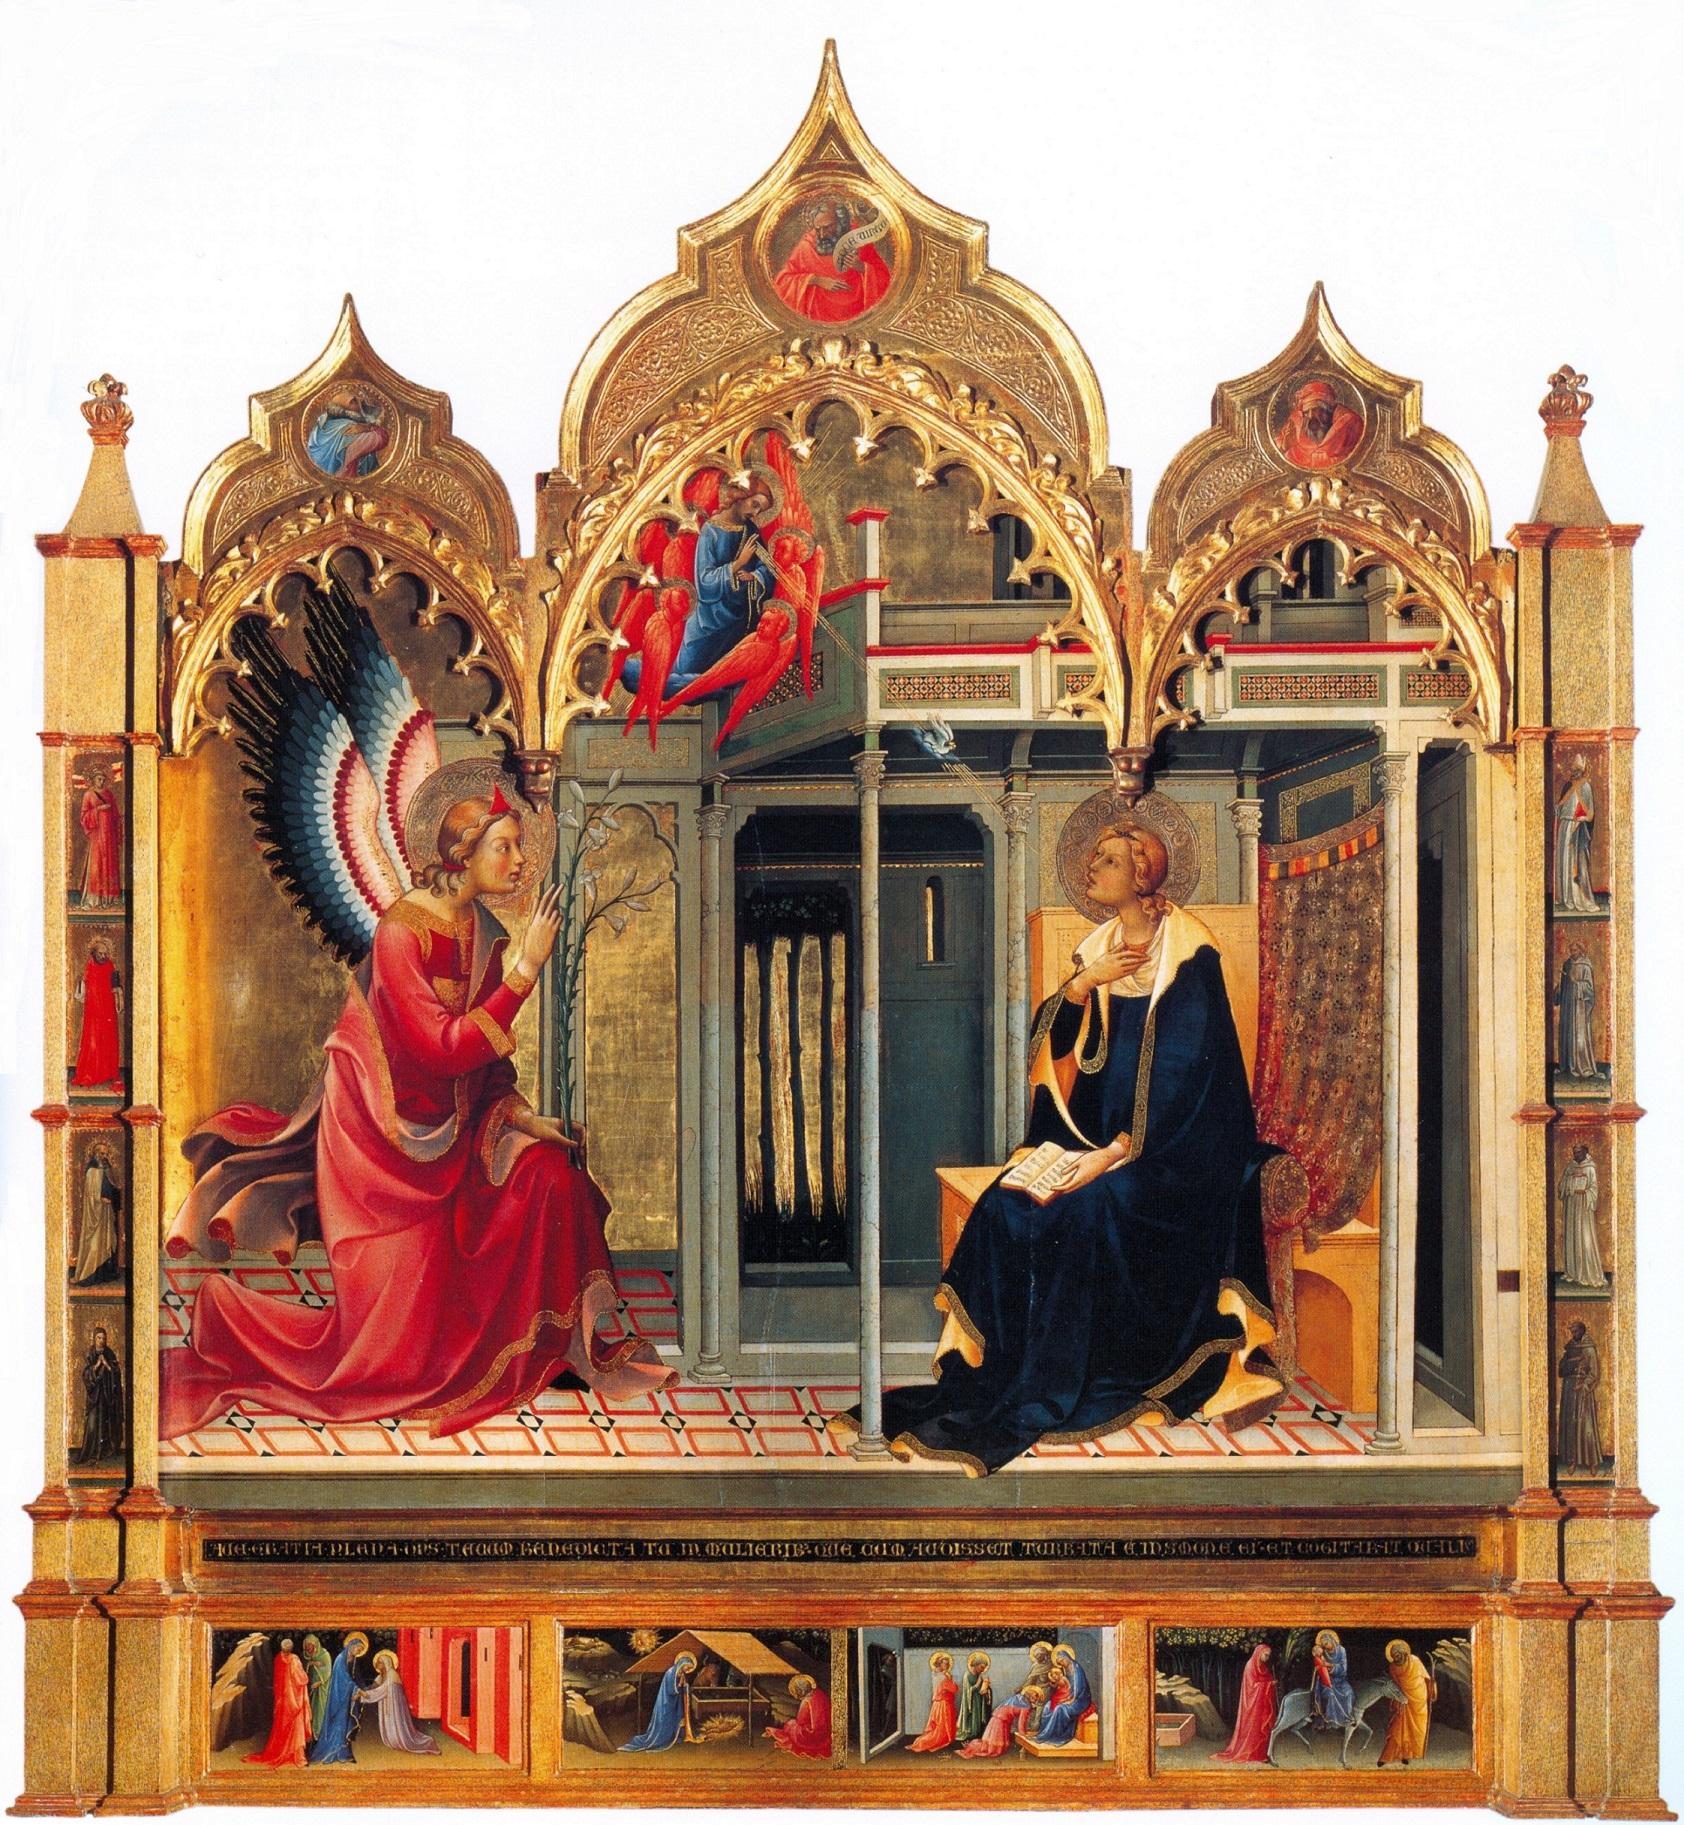 Lorenzo_Monaco,_Annunciation,_1420-25,_C